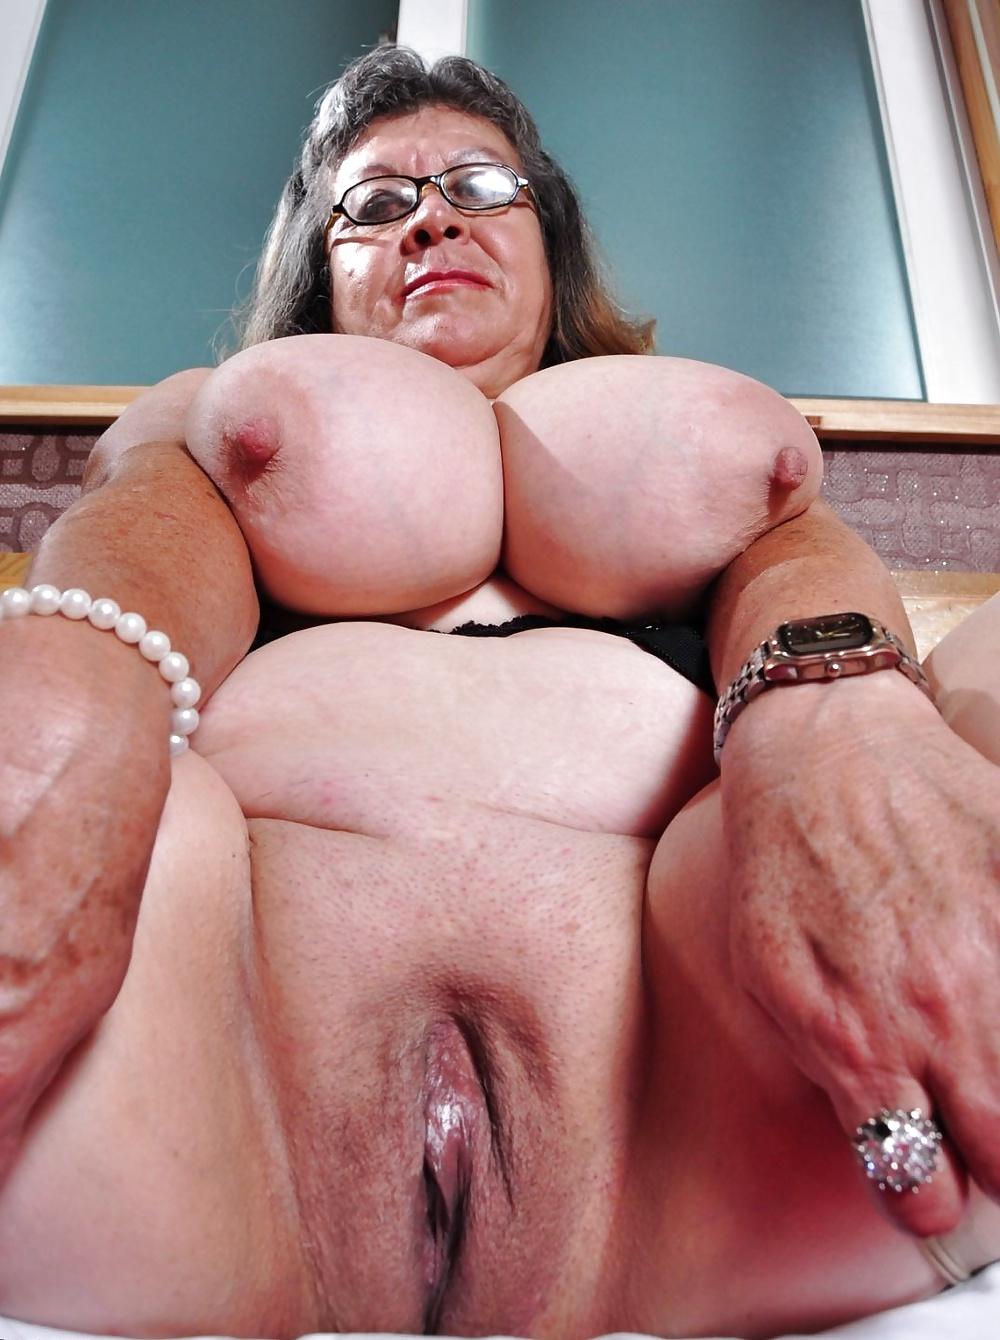 Free big old boobs video, hottest latin porn